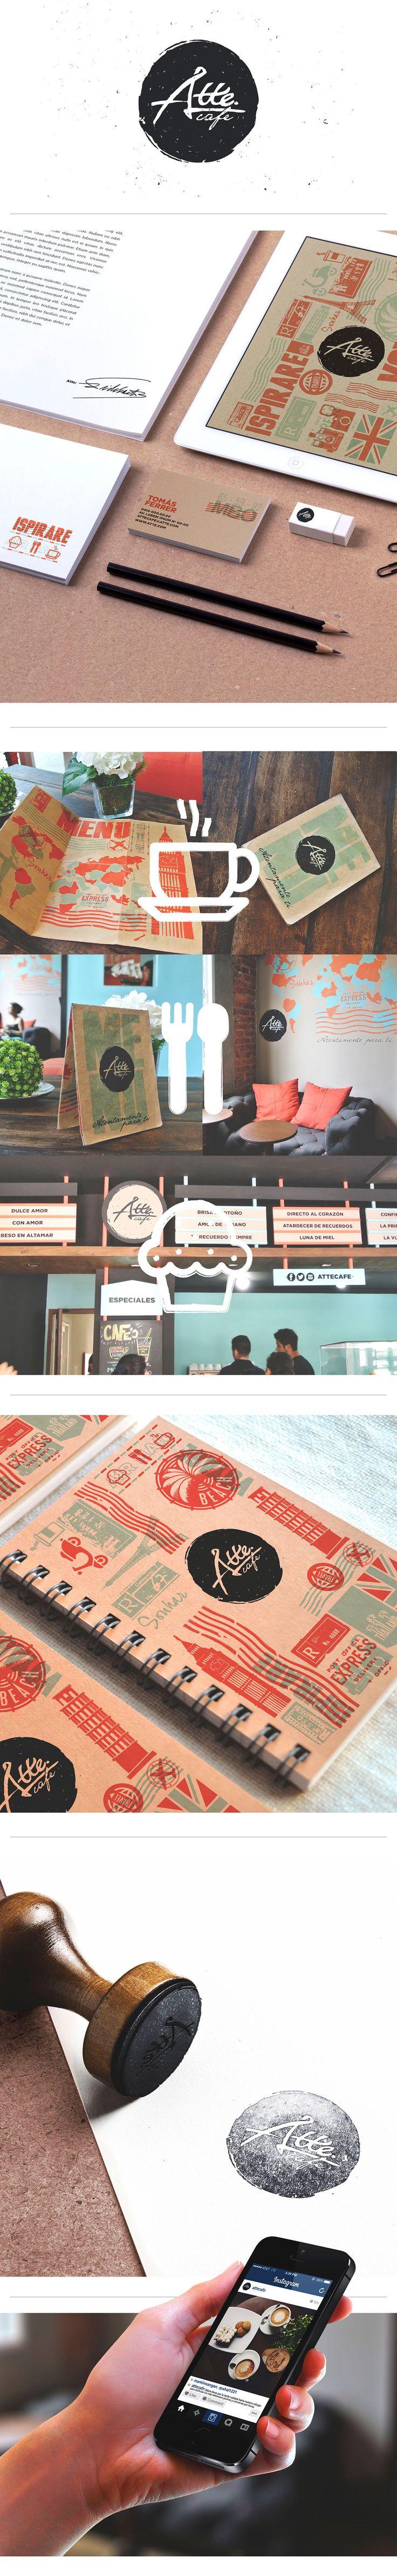 Atte. Café - Branding on Behance